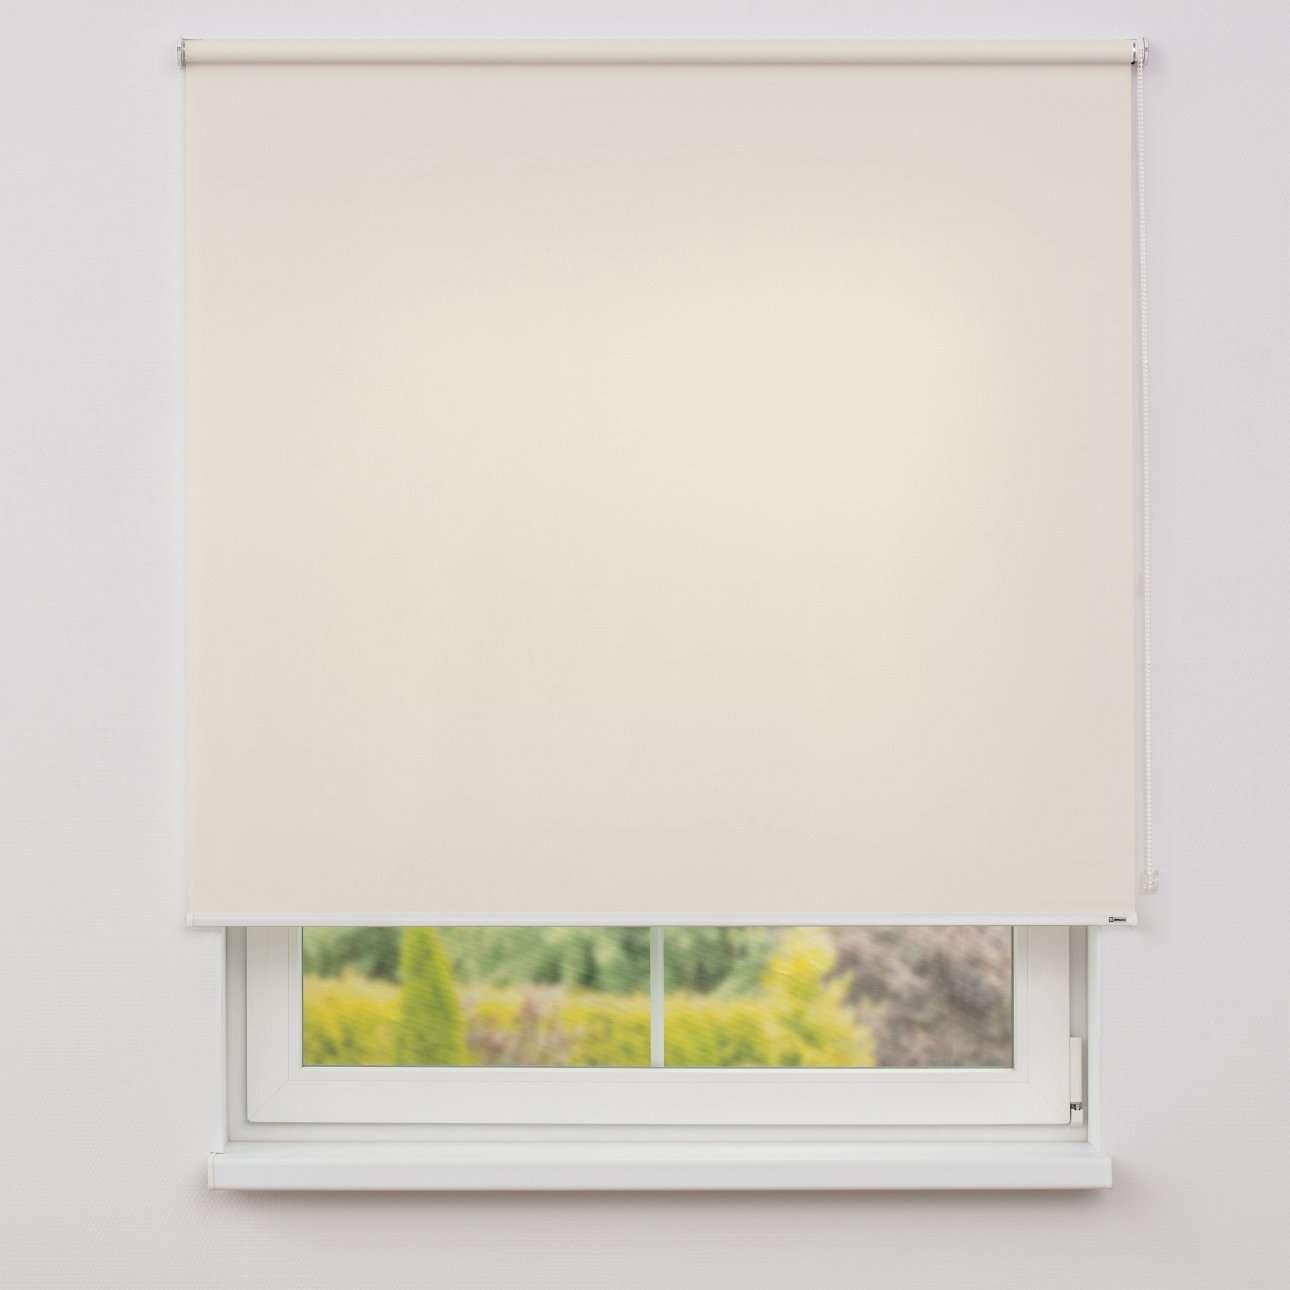 Roller blind in collection Roller blind transparent, fabric: 4905